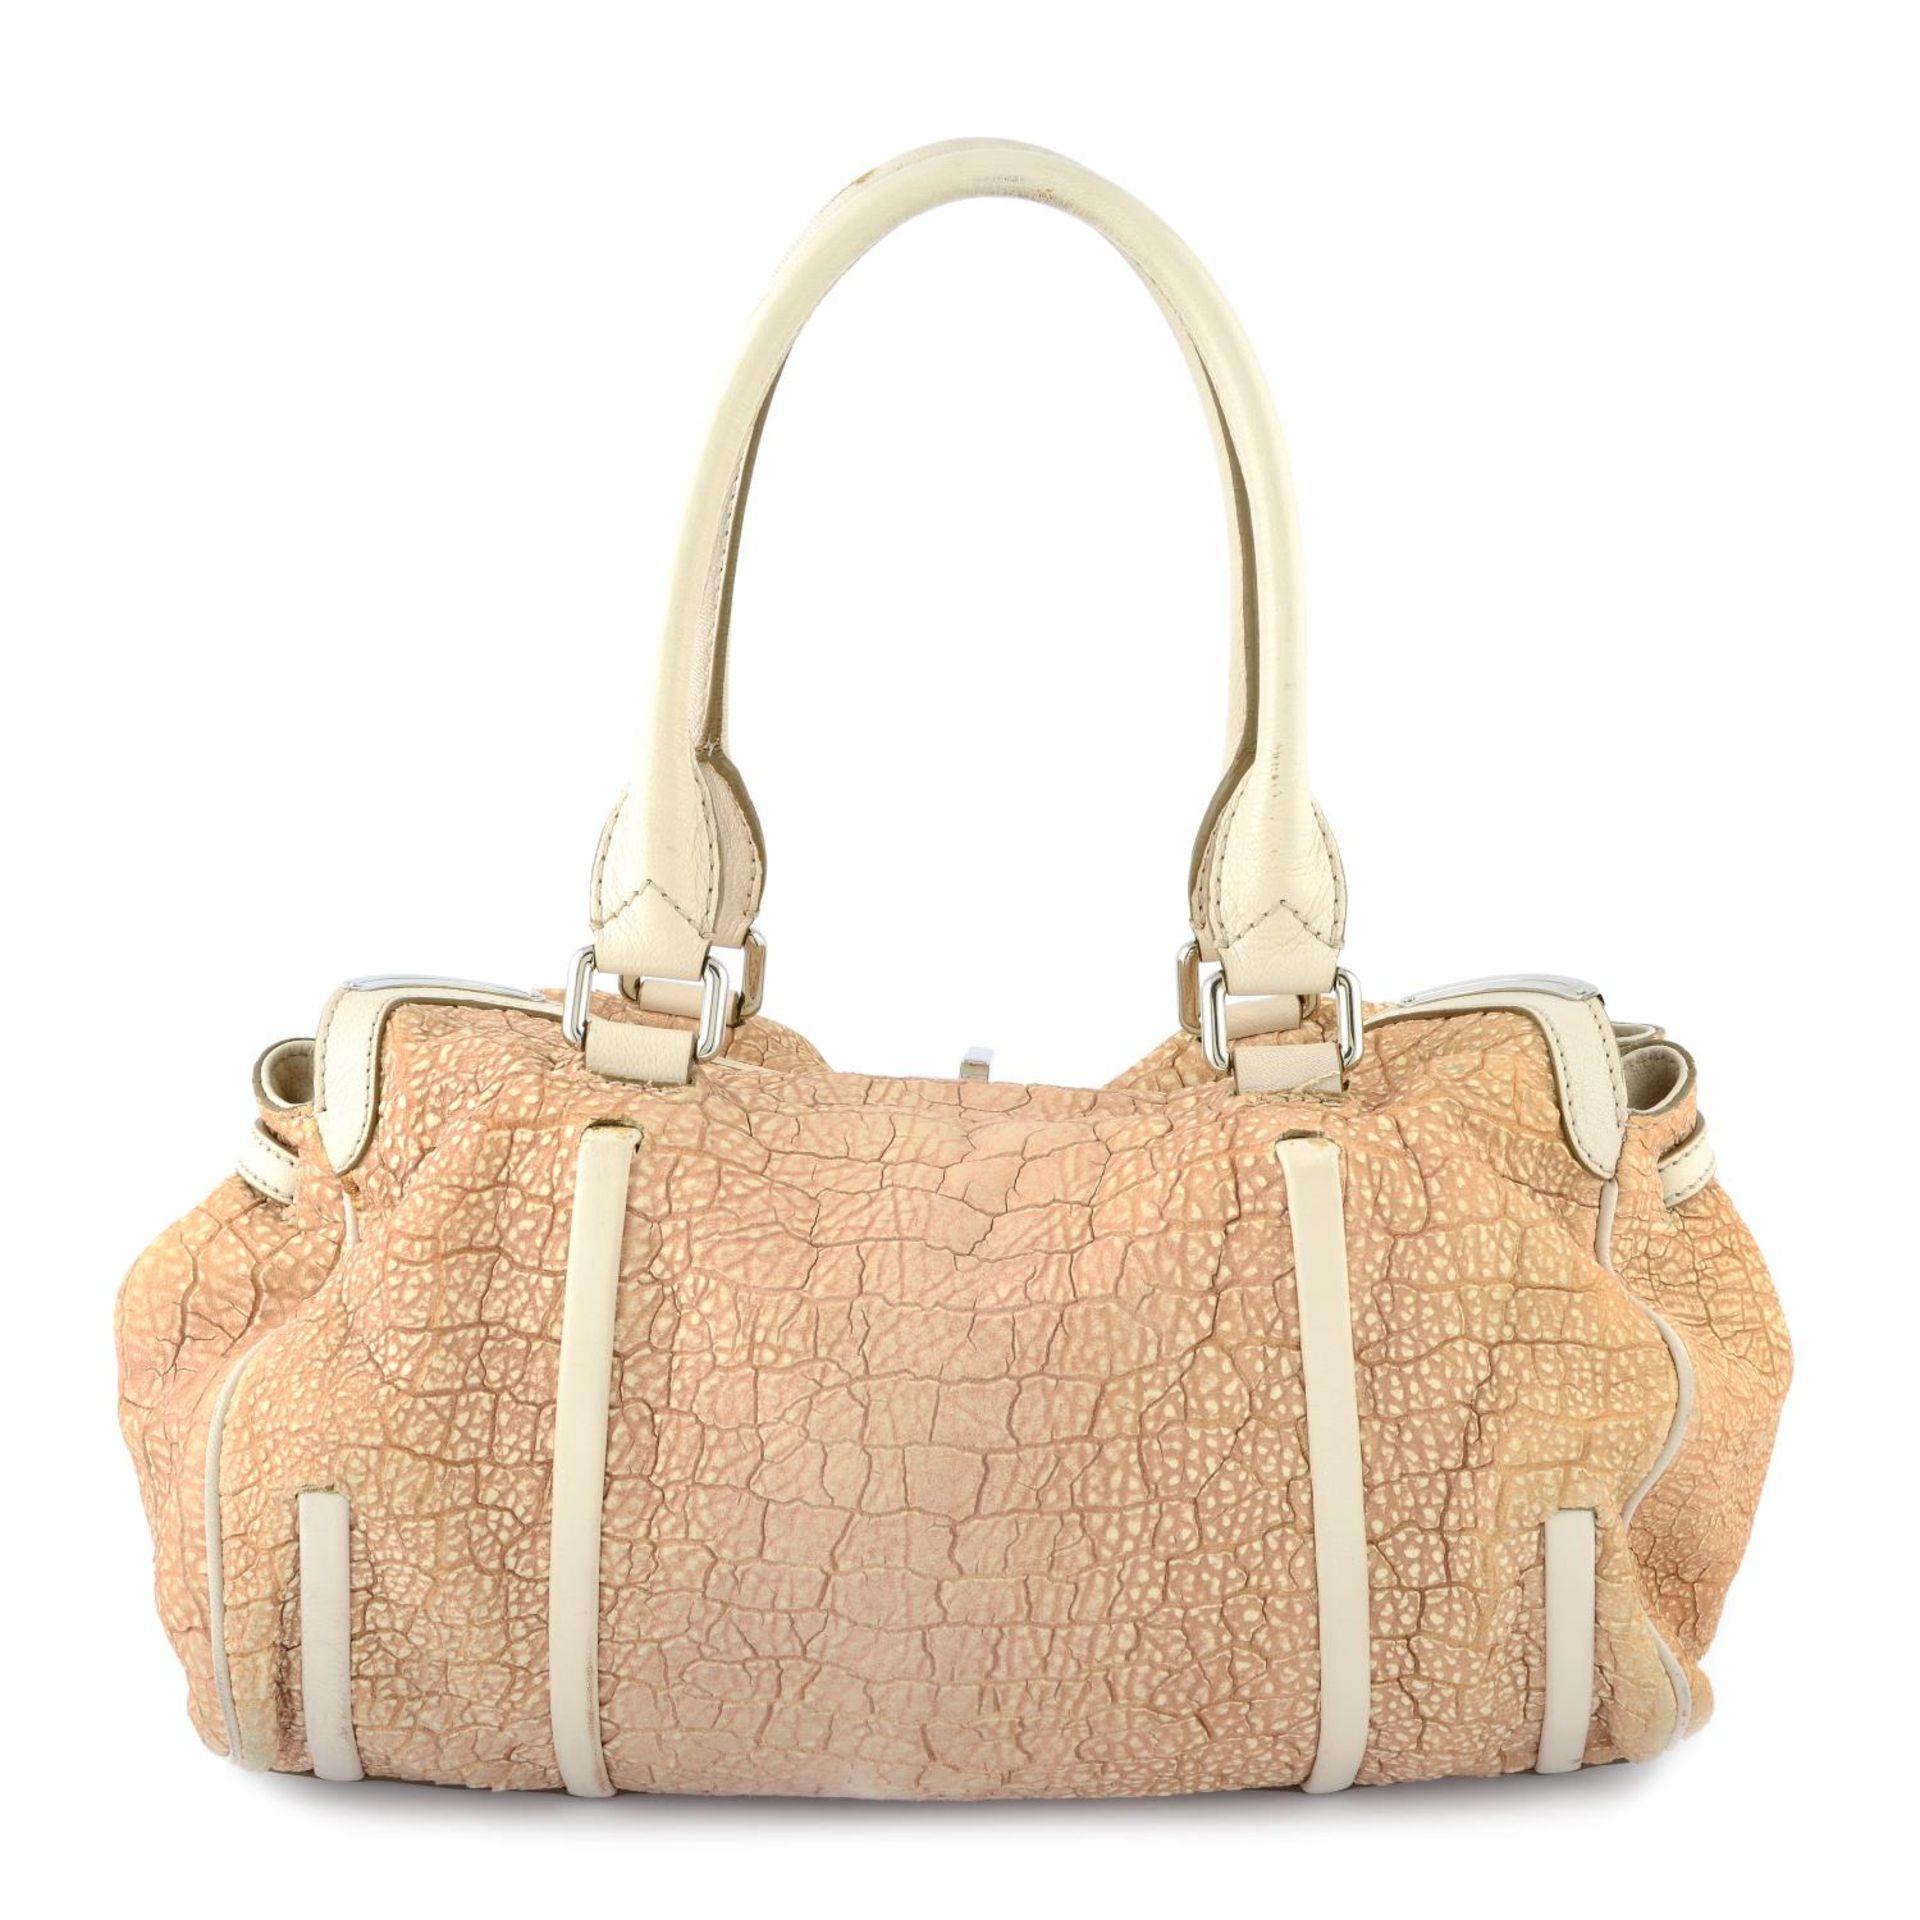 CÉLINE - a nude textured leather handbag. - Image 2 of 4